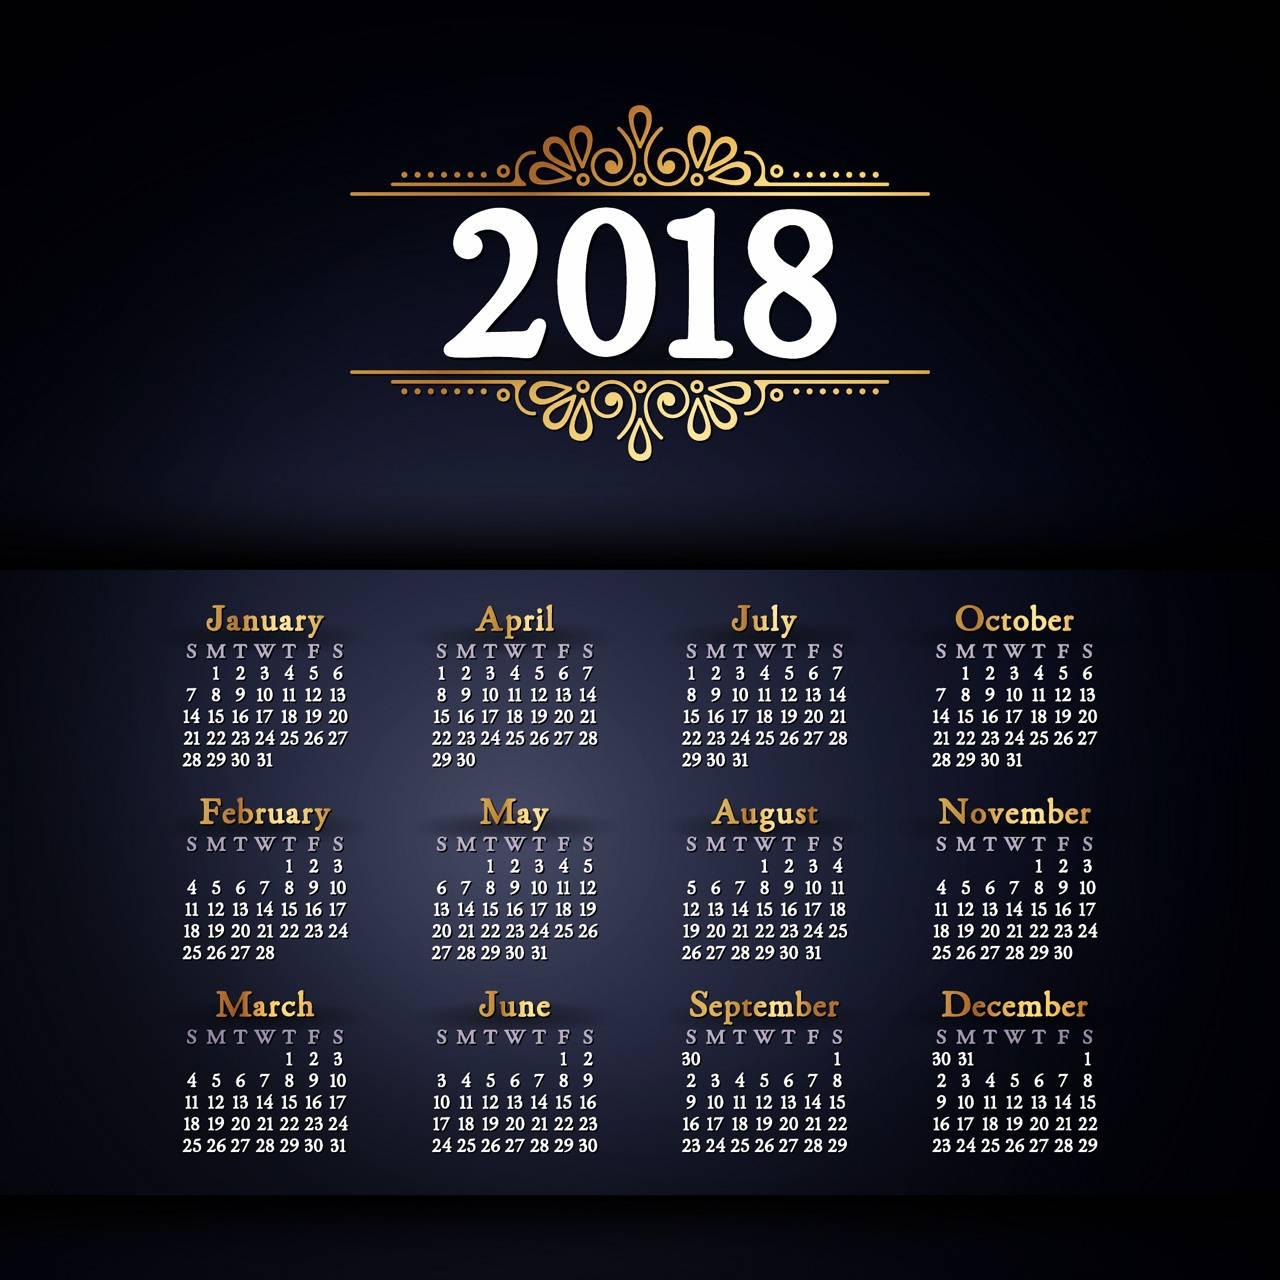 Calendar 2018 Wallpaper By Husnain55 2c Free On Zedge